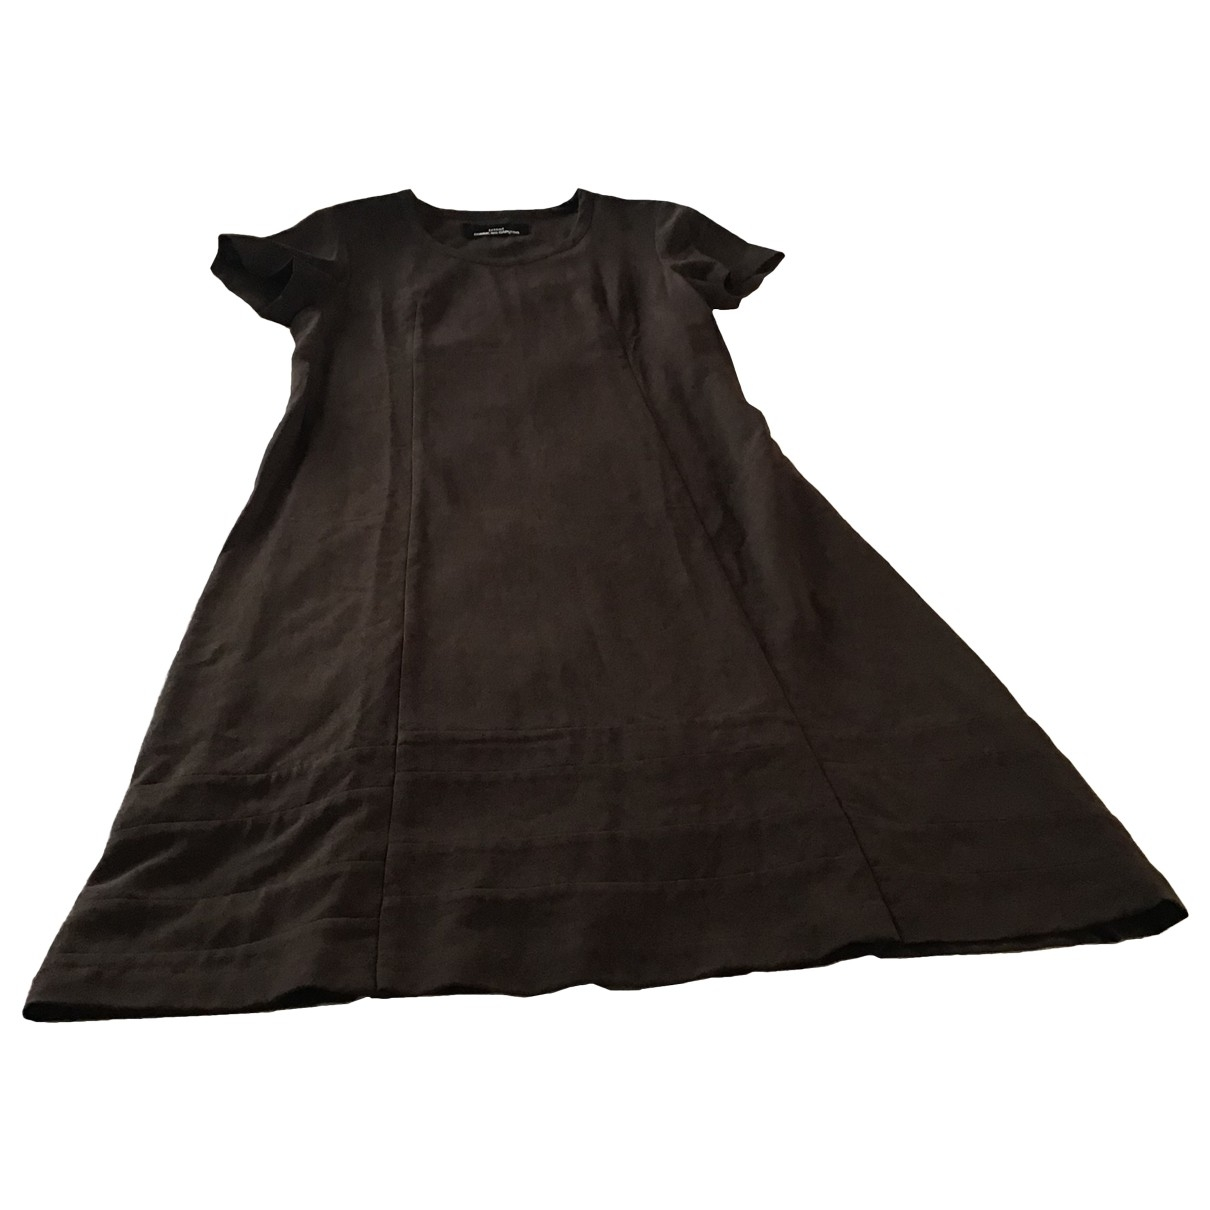 Comme Des Garcons \N Brown Wool dress for Women S International